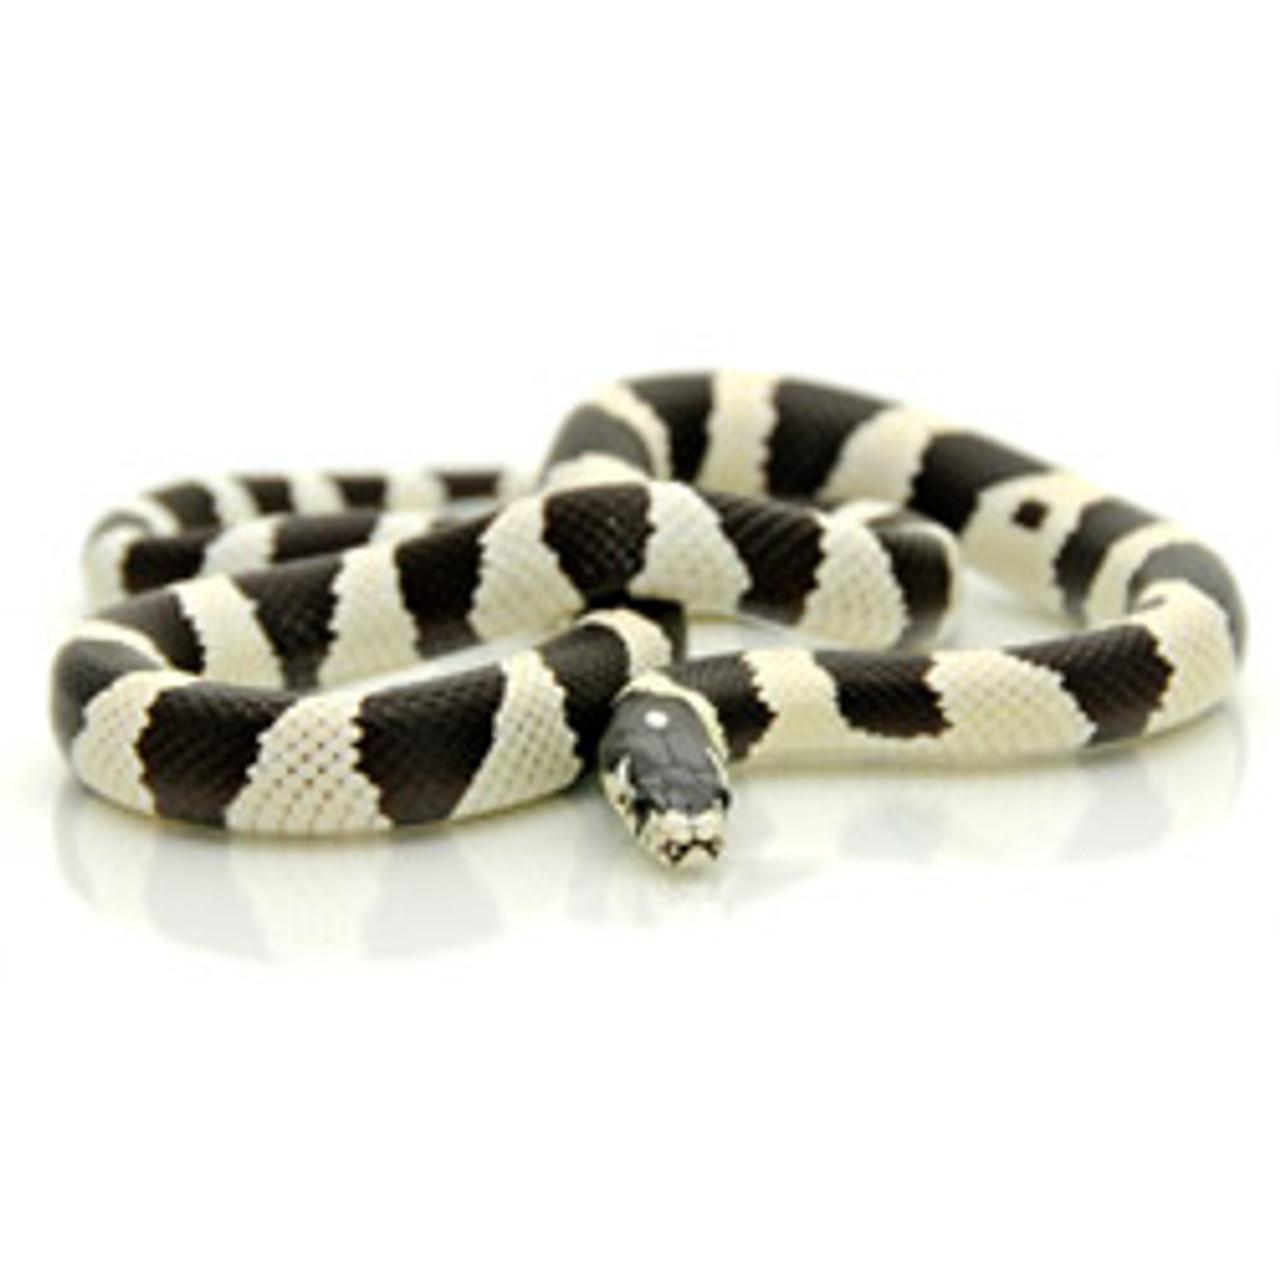 Black & White Banded California King Snake (Lampropeltis getula)